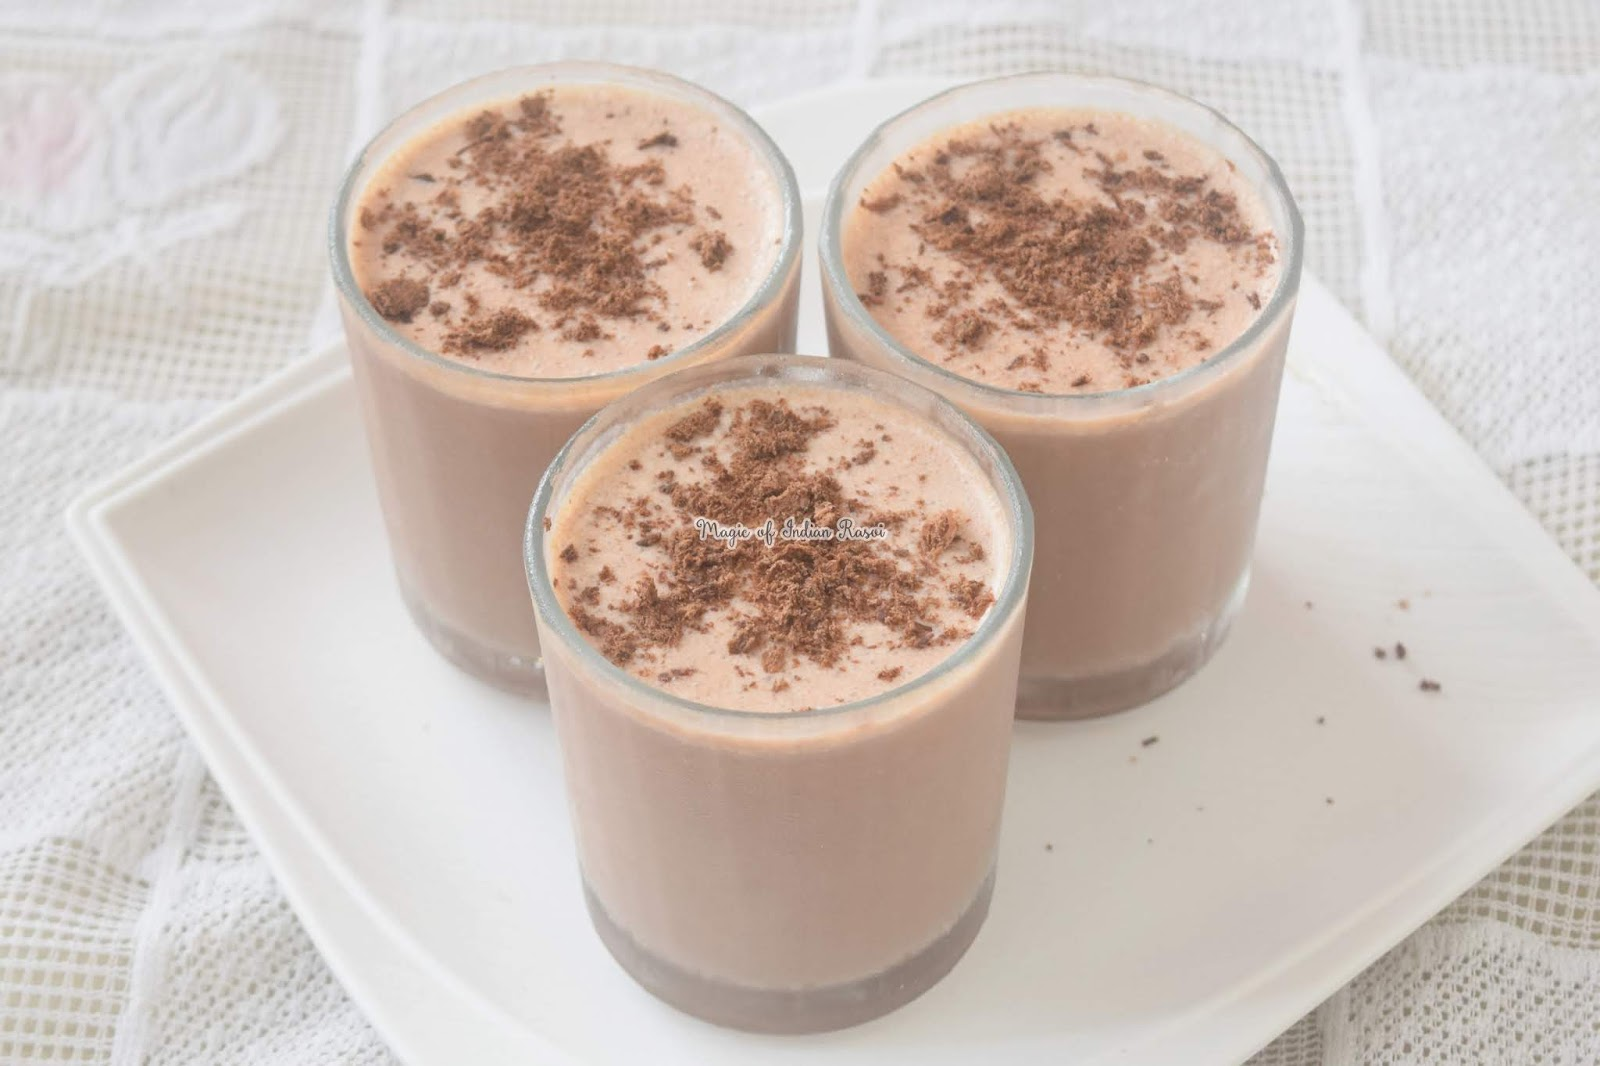 Cold Coco Premix  Cold Cocoa Milkshake Recipe - इंस्टेंट कोल्ड कोको मिक्स रेसिपी - Priya R - Magic of Indian Rasoi